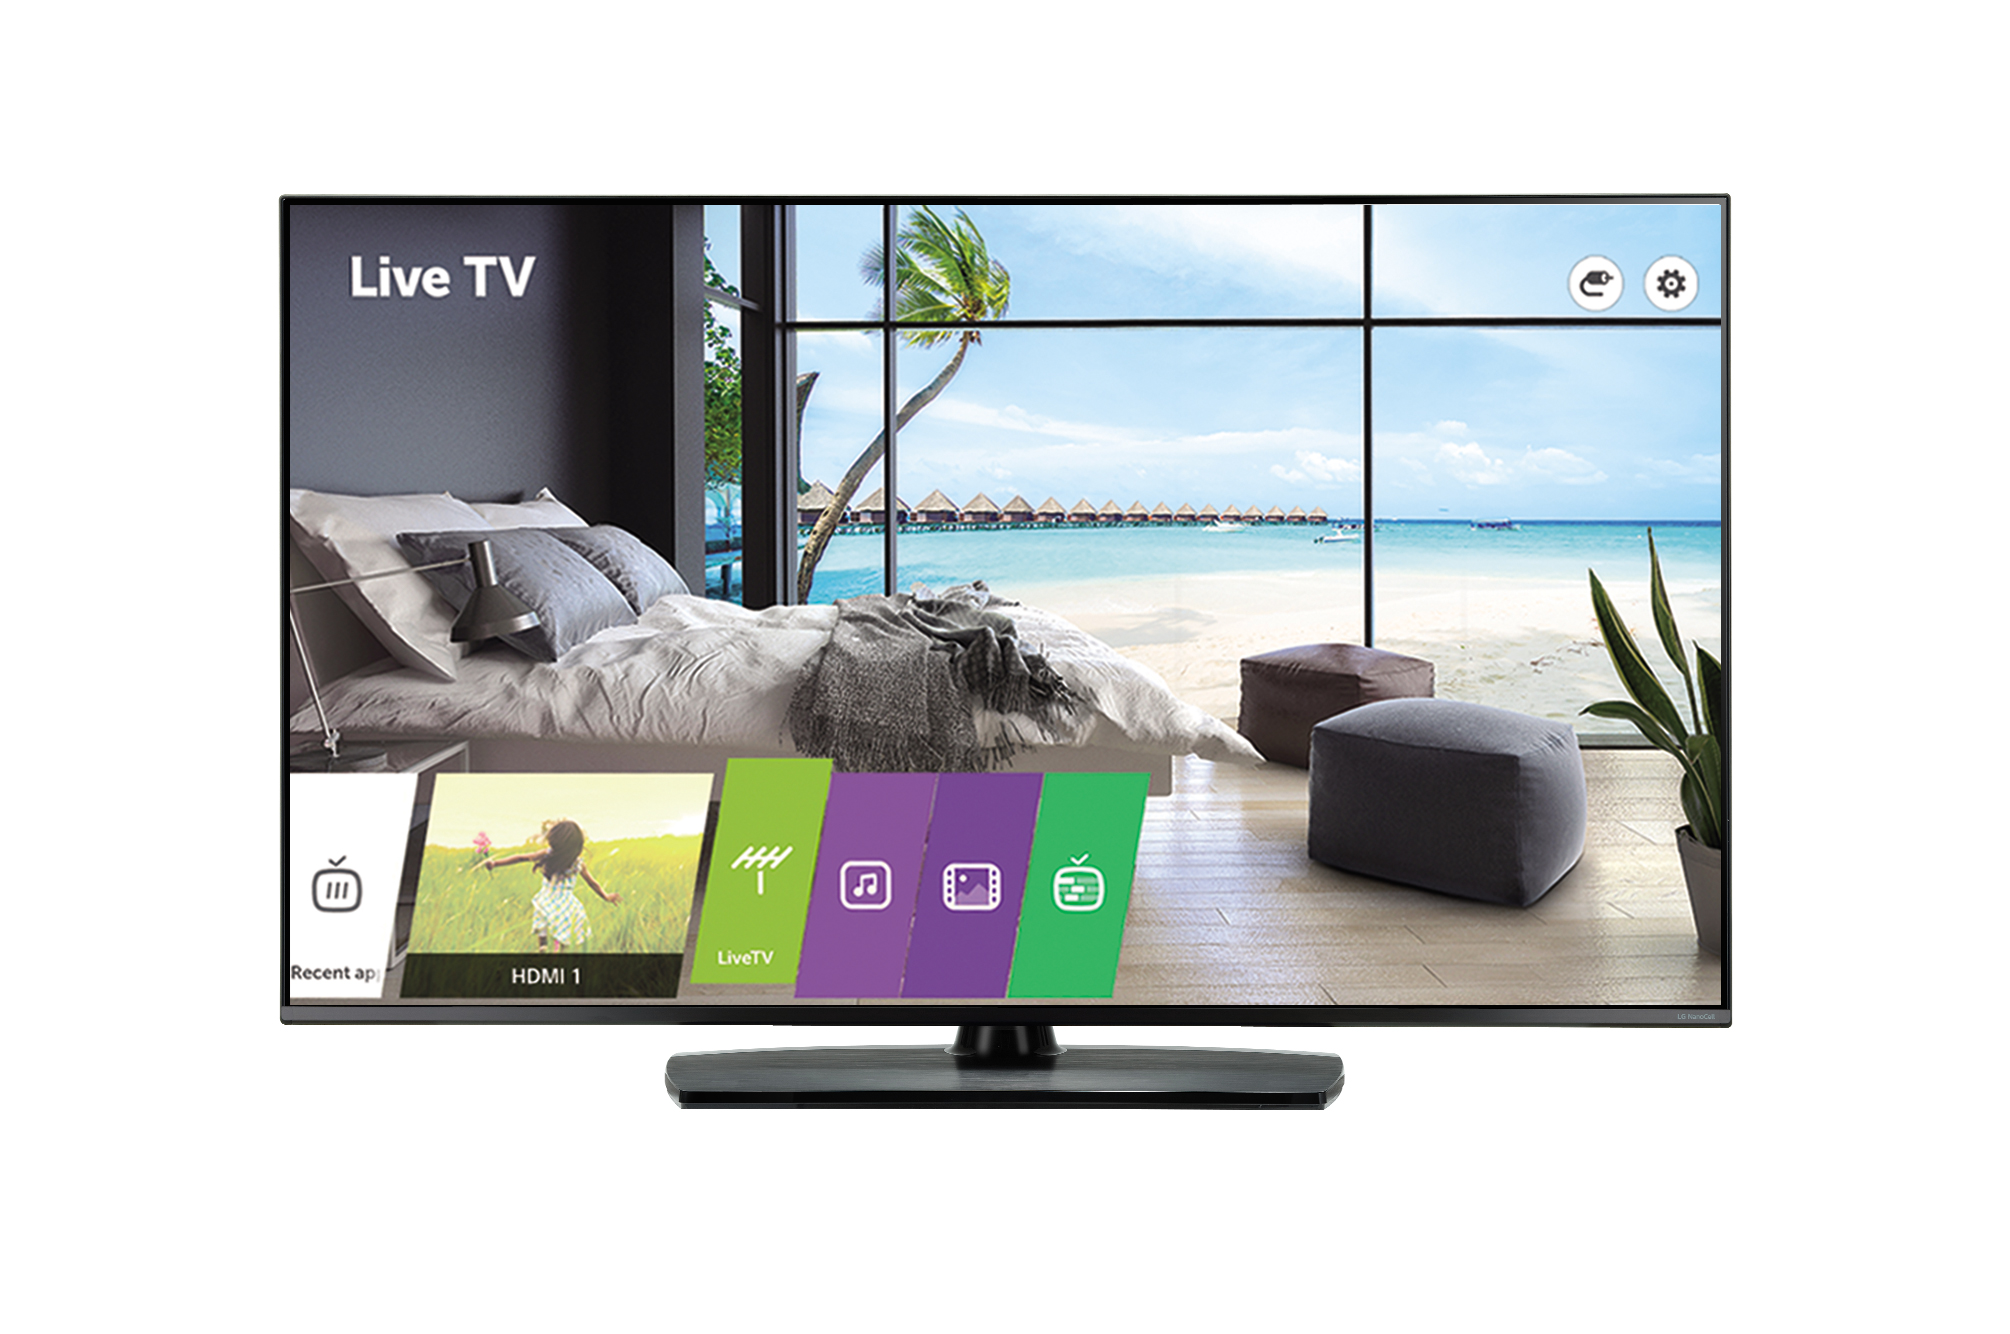 LG Pro:Centric SMART 49UT761H (ASIA)